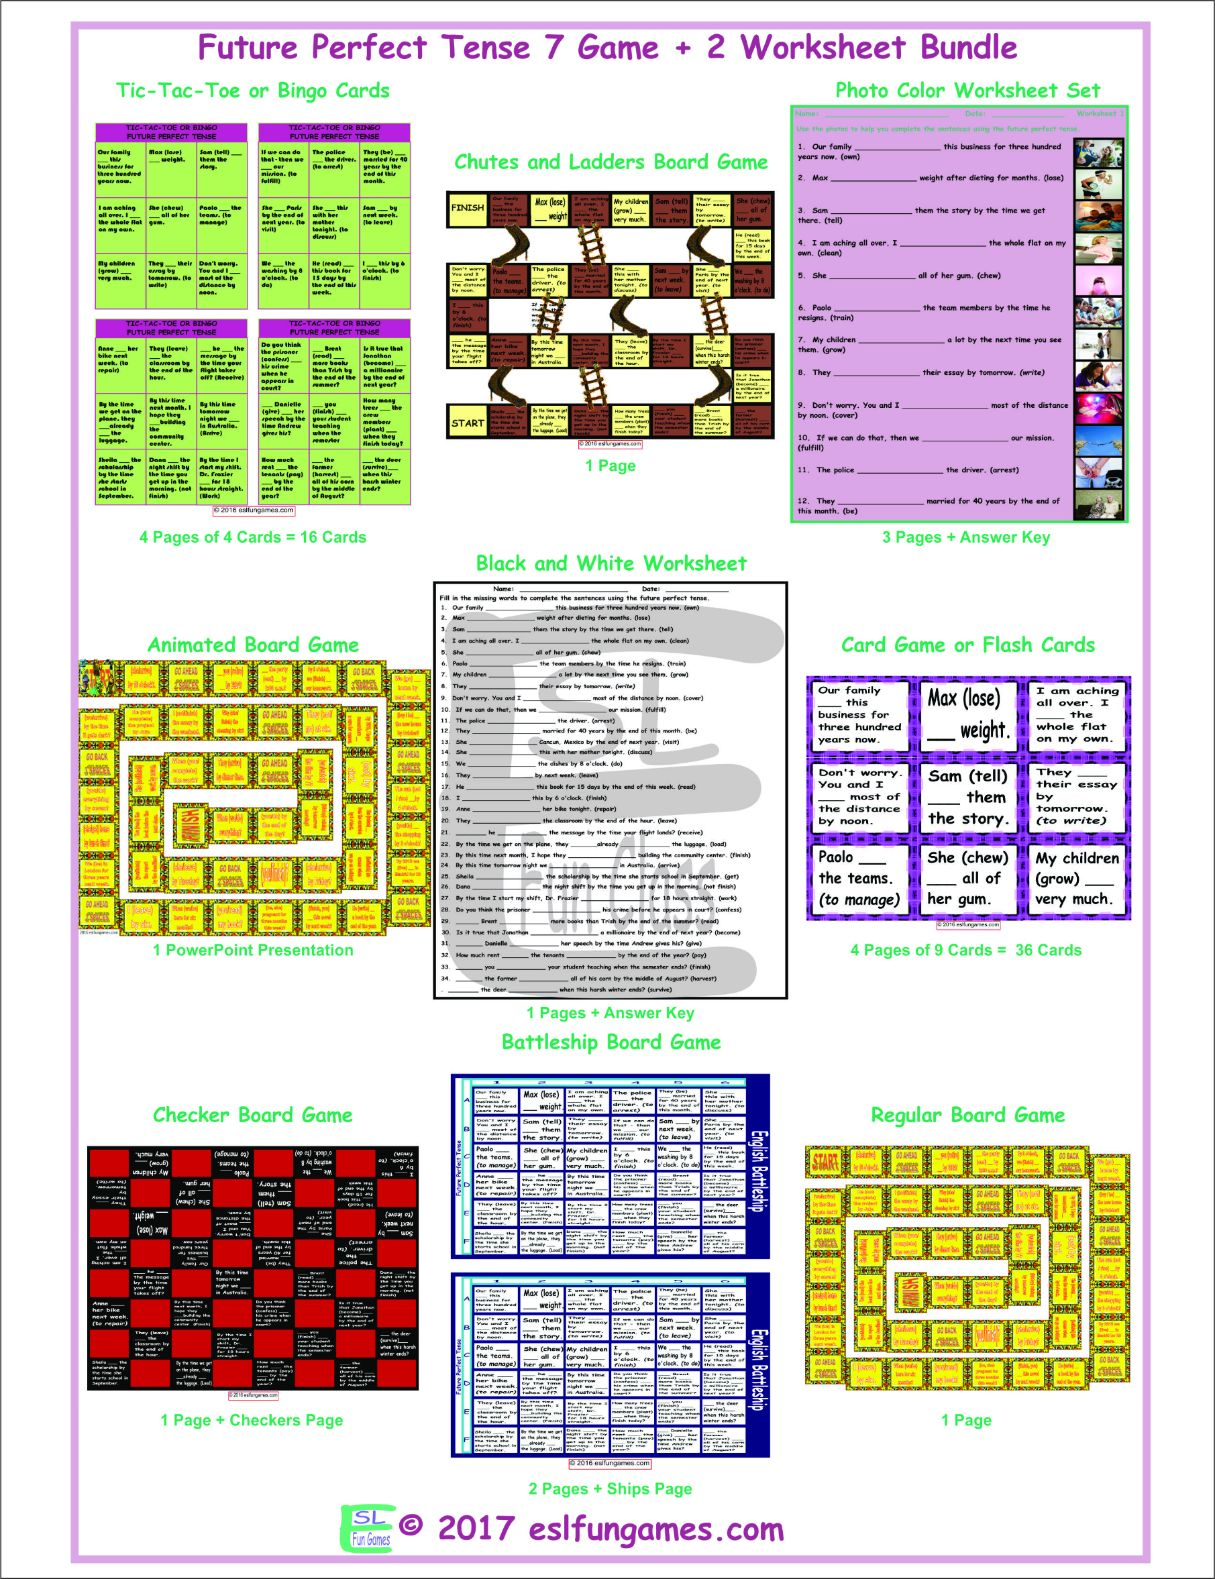 Future Perfect Tense 7 Game Plus 2 Worksheet Bundle By Eslfungames